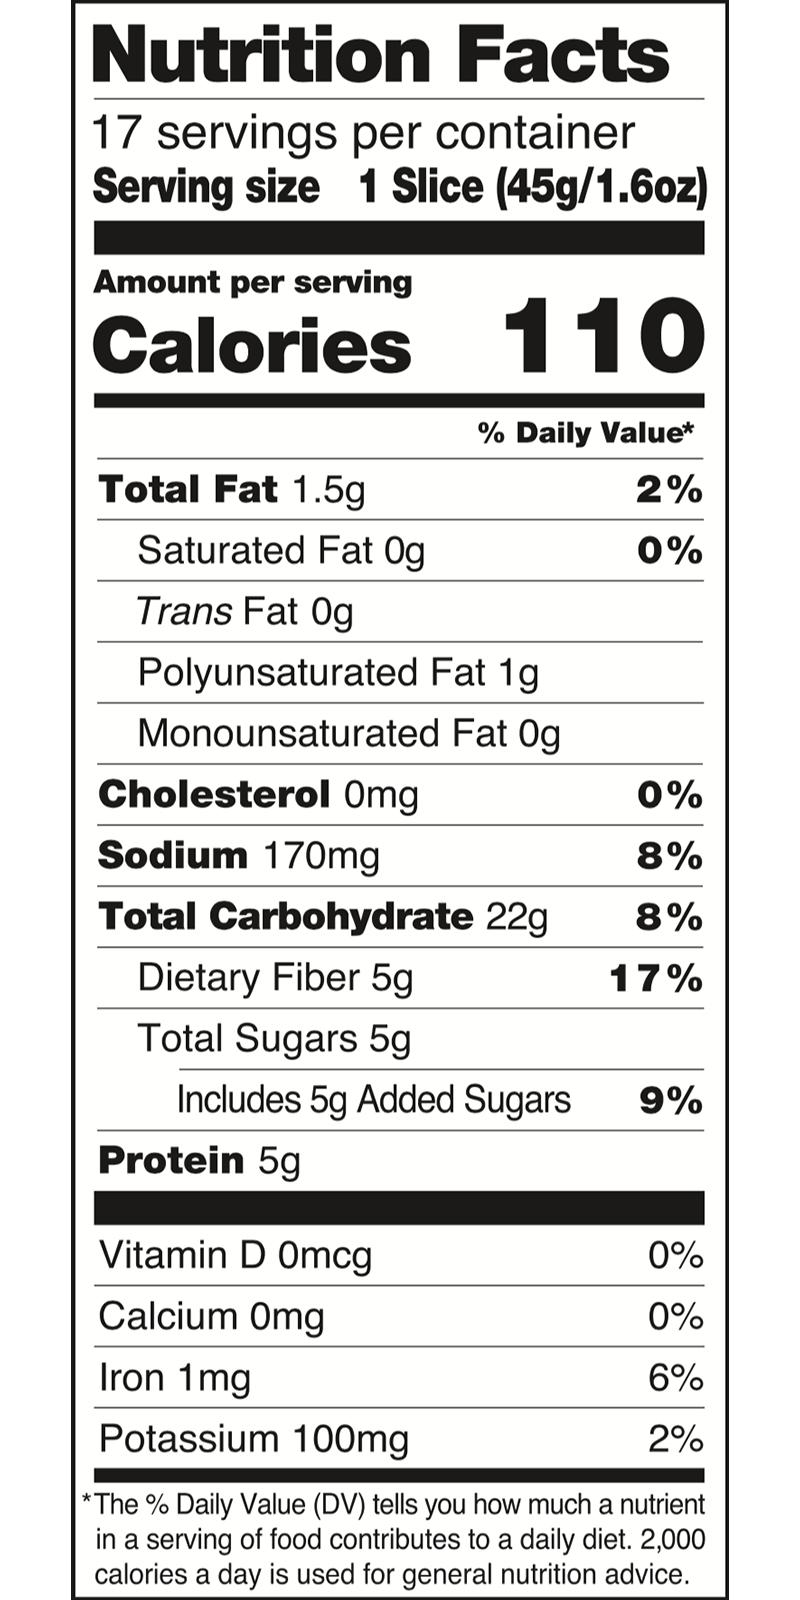 Dave's Killer Bread Nutrition